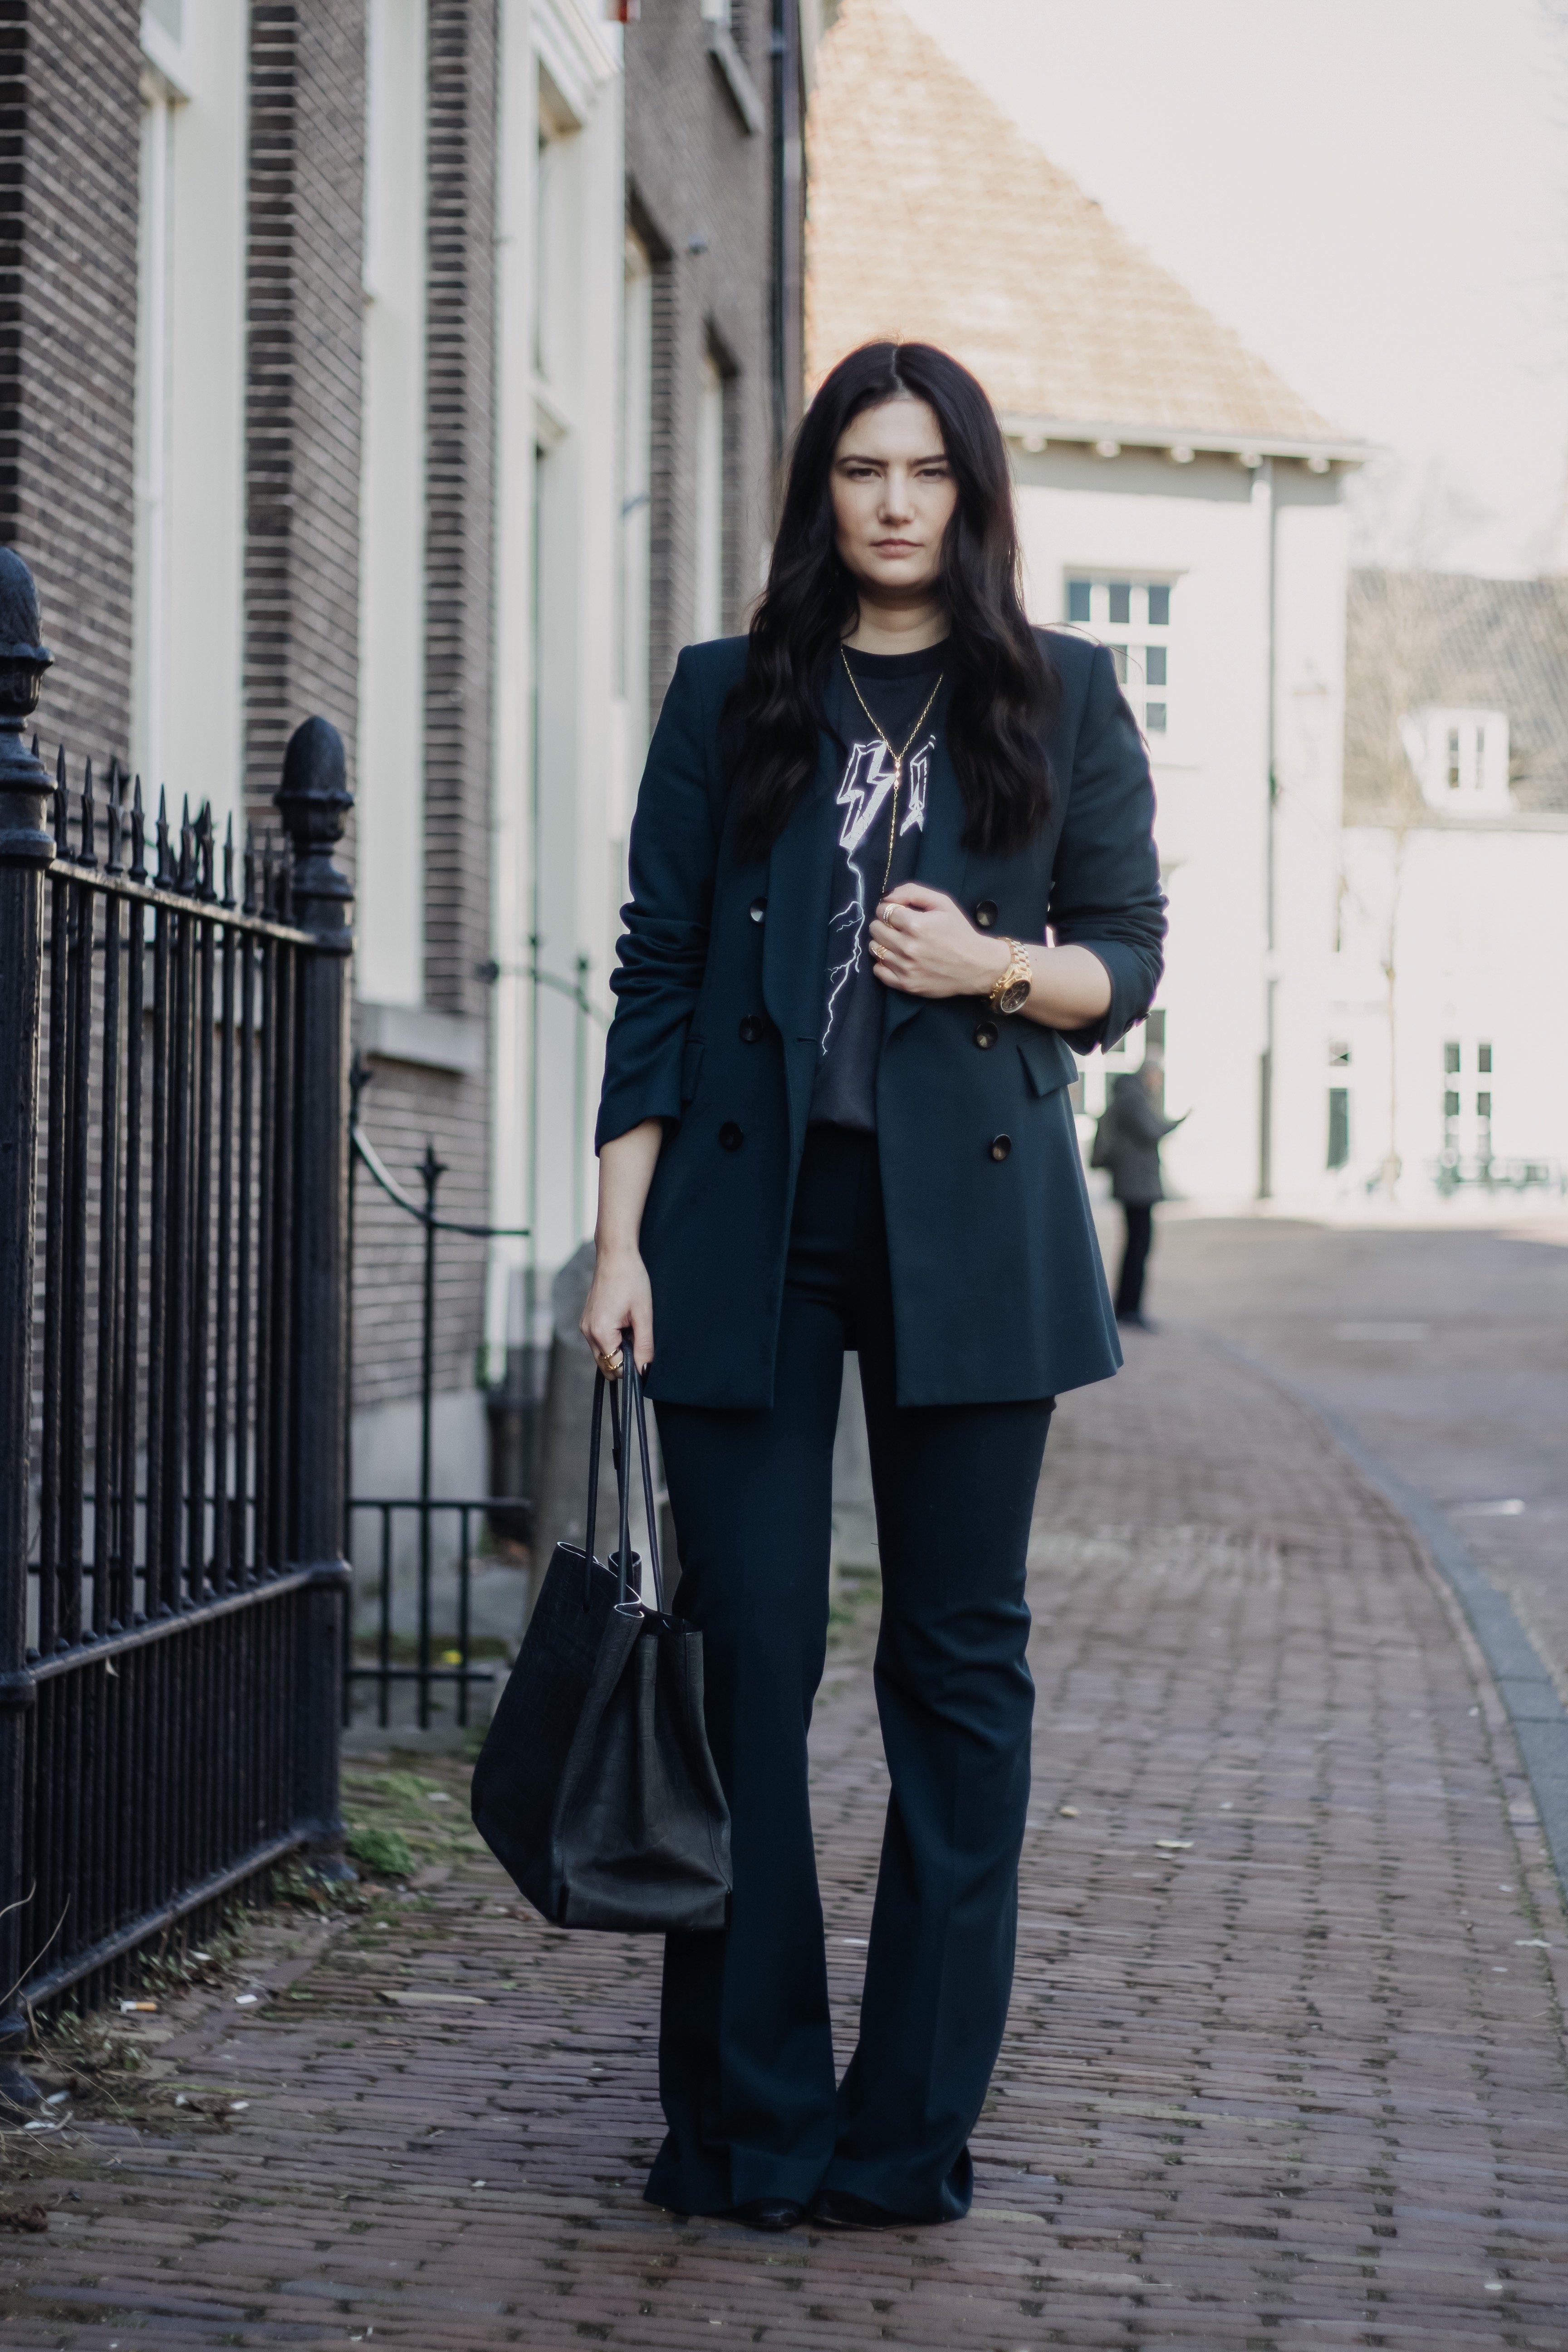 About | Fiona Gobbo Creative | Brand designer in Amersfoort